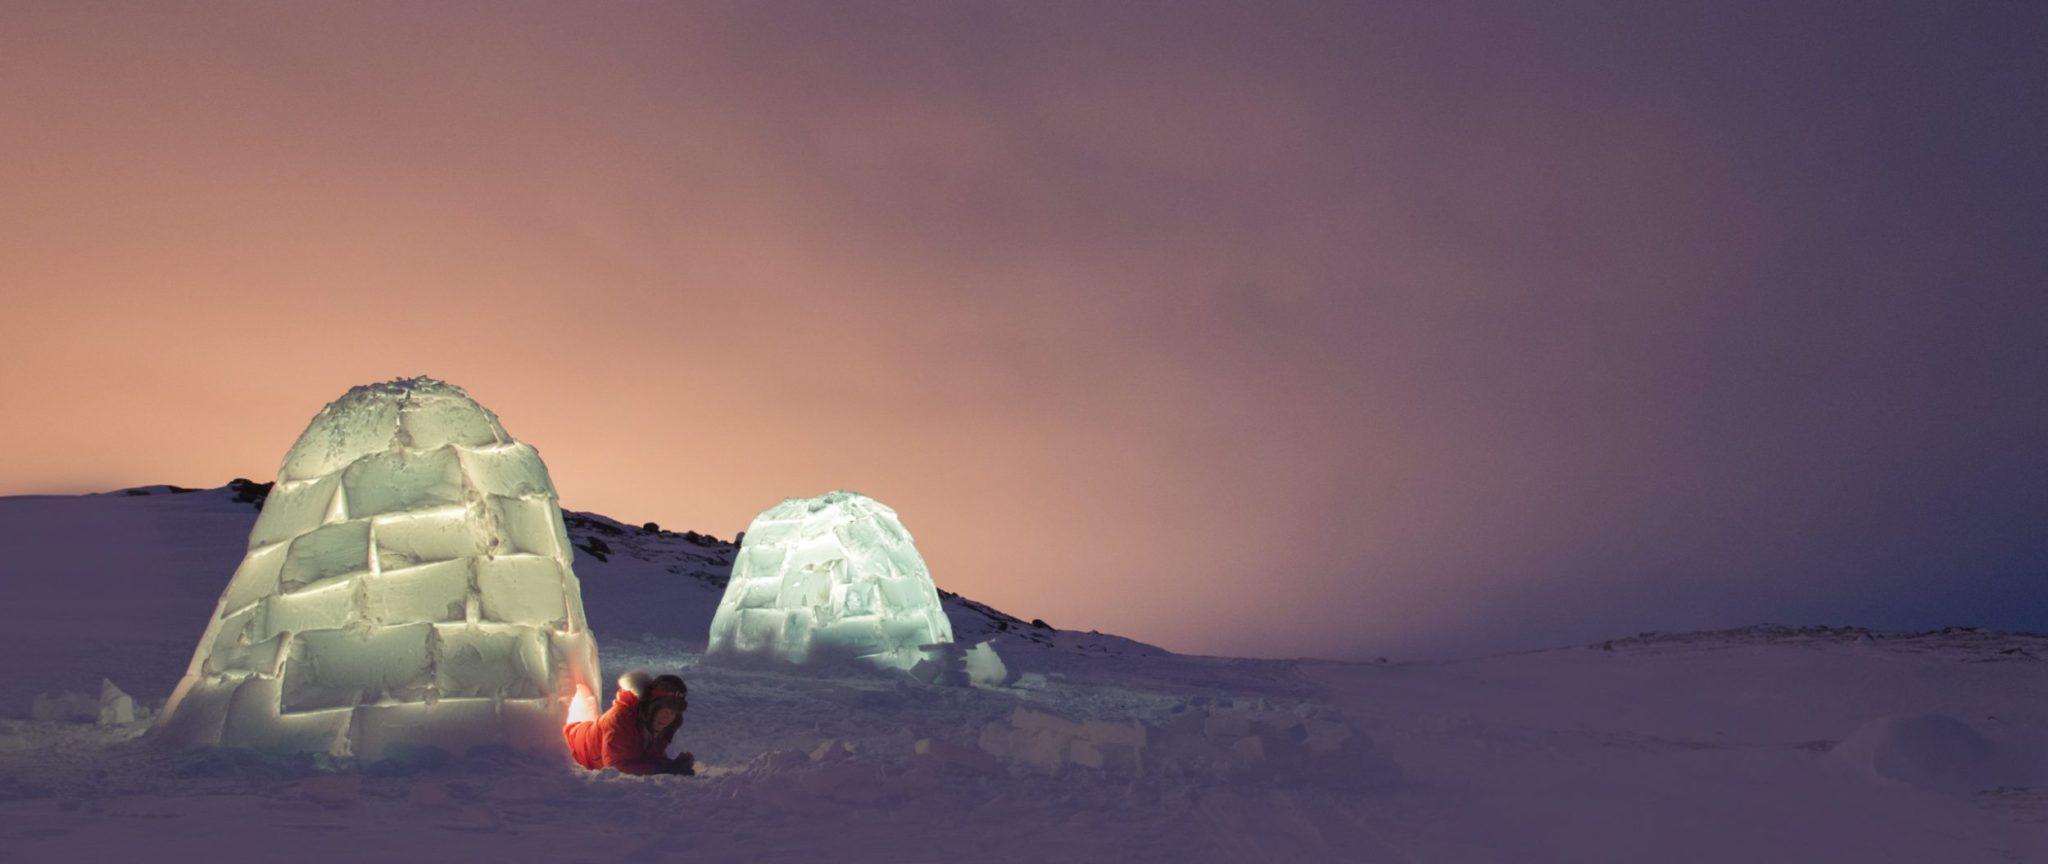 Explore Iqaluit Nunavut Tourism & Guide | Arctic Kingdom